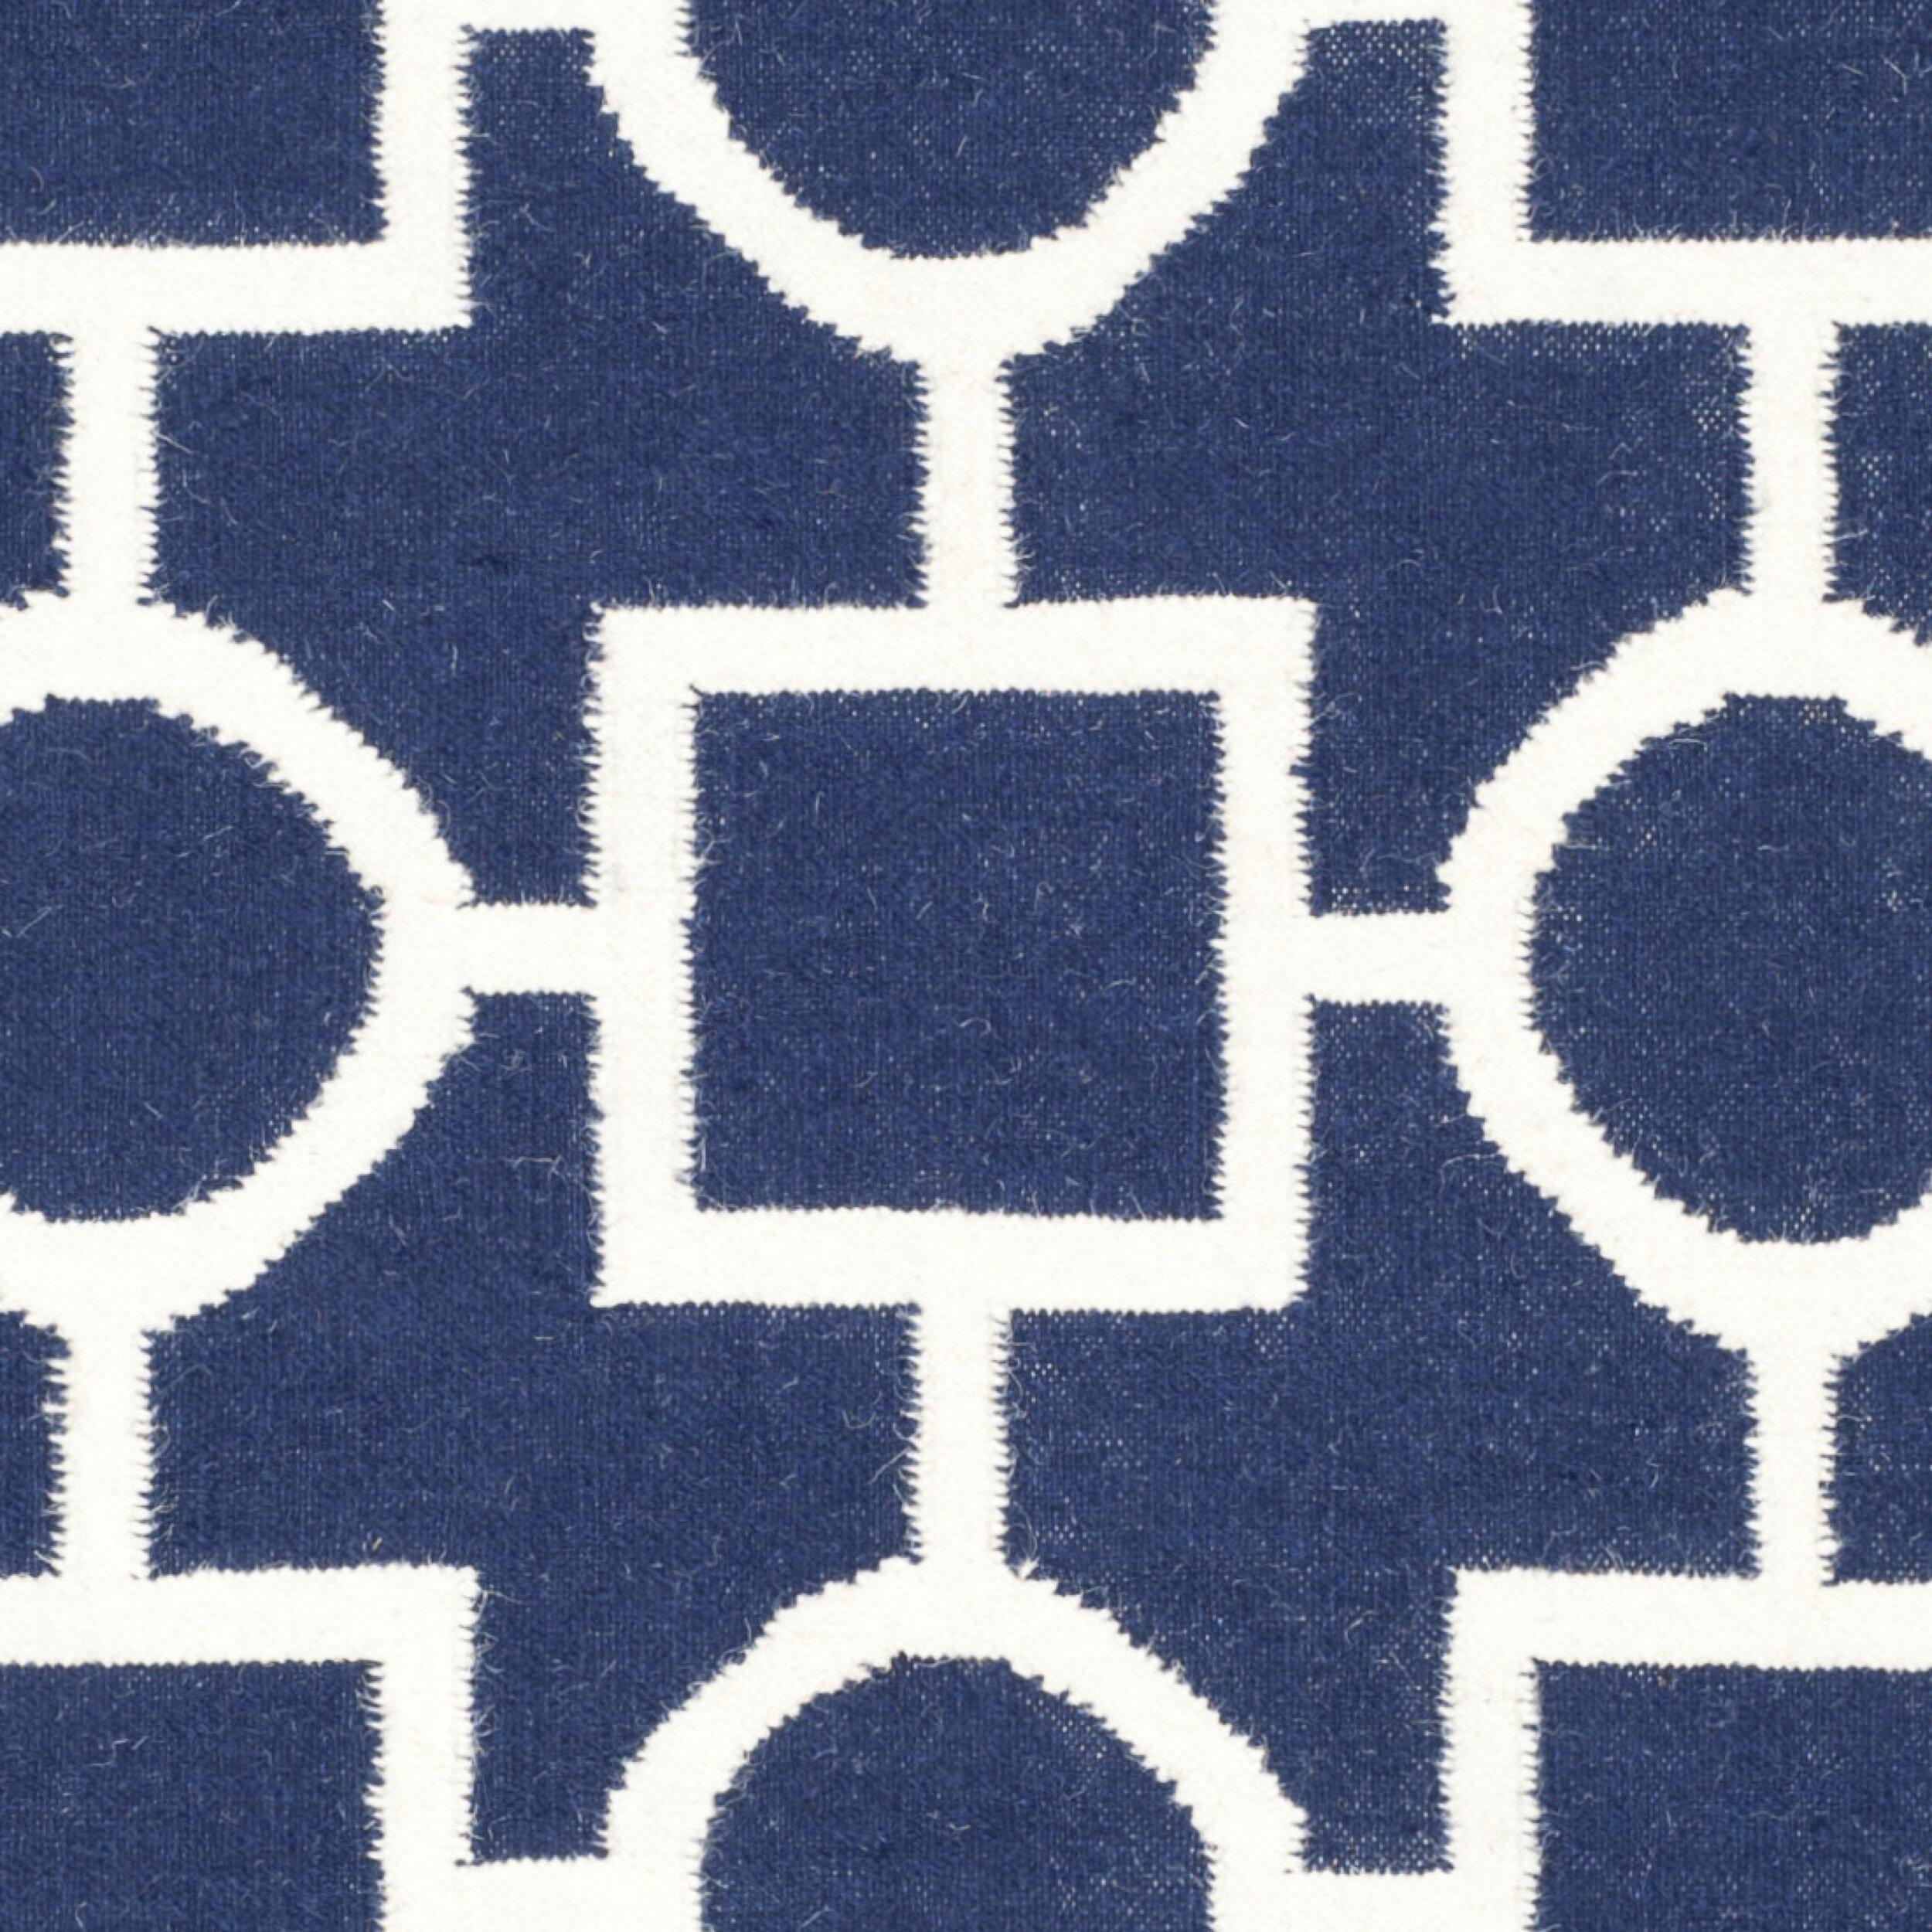 safavieh dhurries navy white area rug wayfair. Black Bedroom Furniture Sets. Home Design Ideas